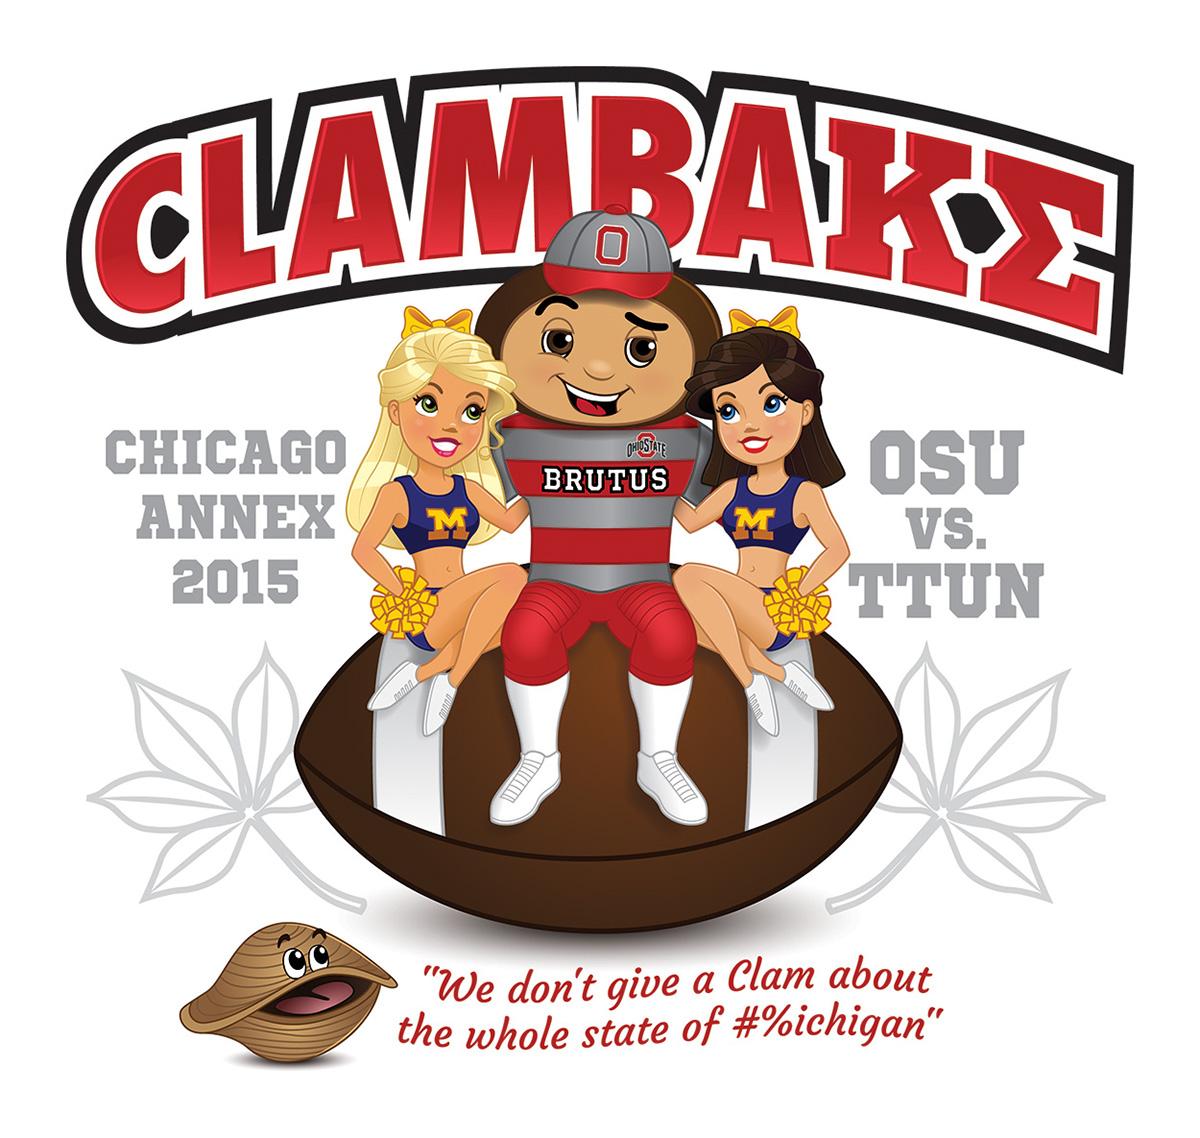 brutus buckeye osu clambake t-shirt football cheerleader